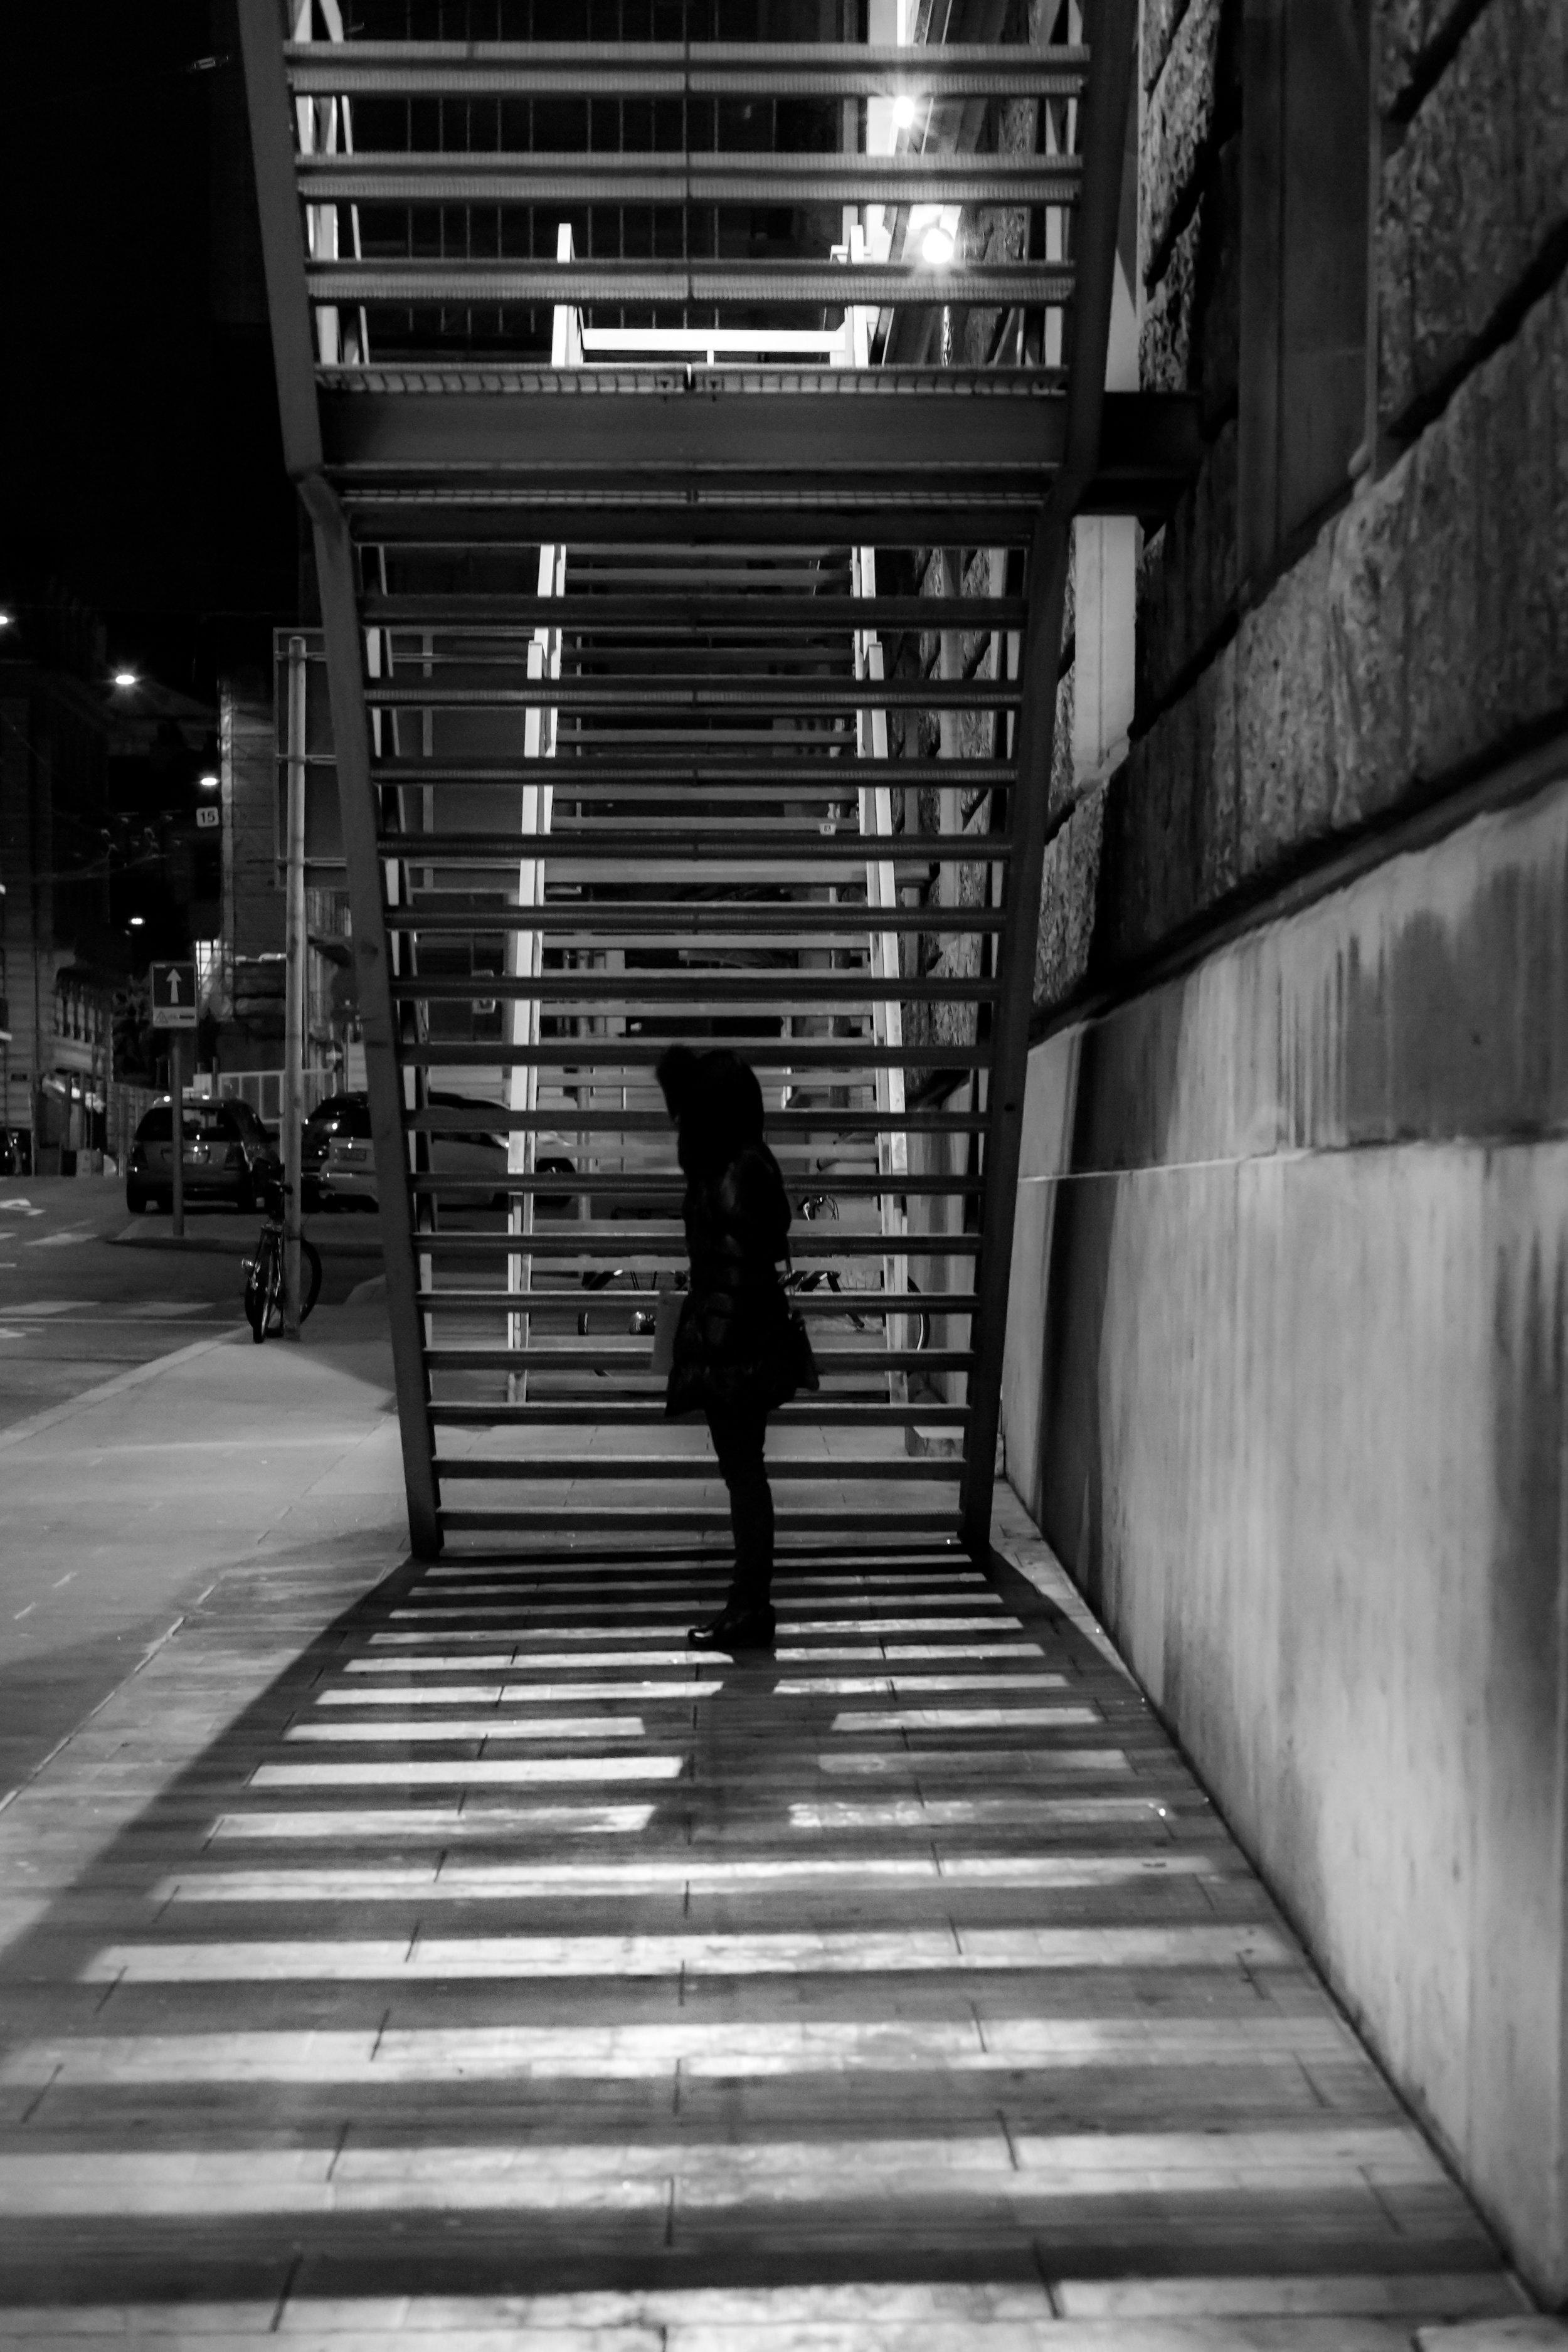 shadows-9215.jpg